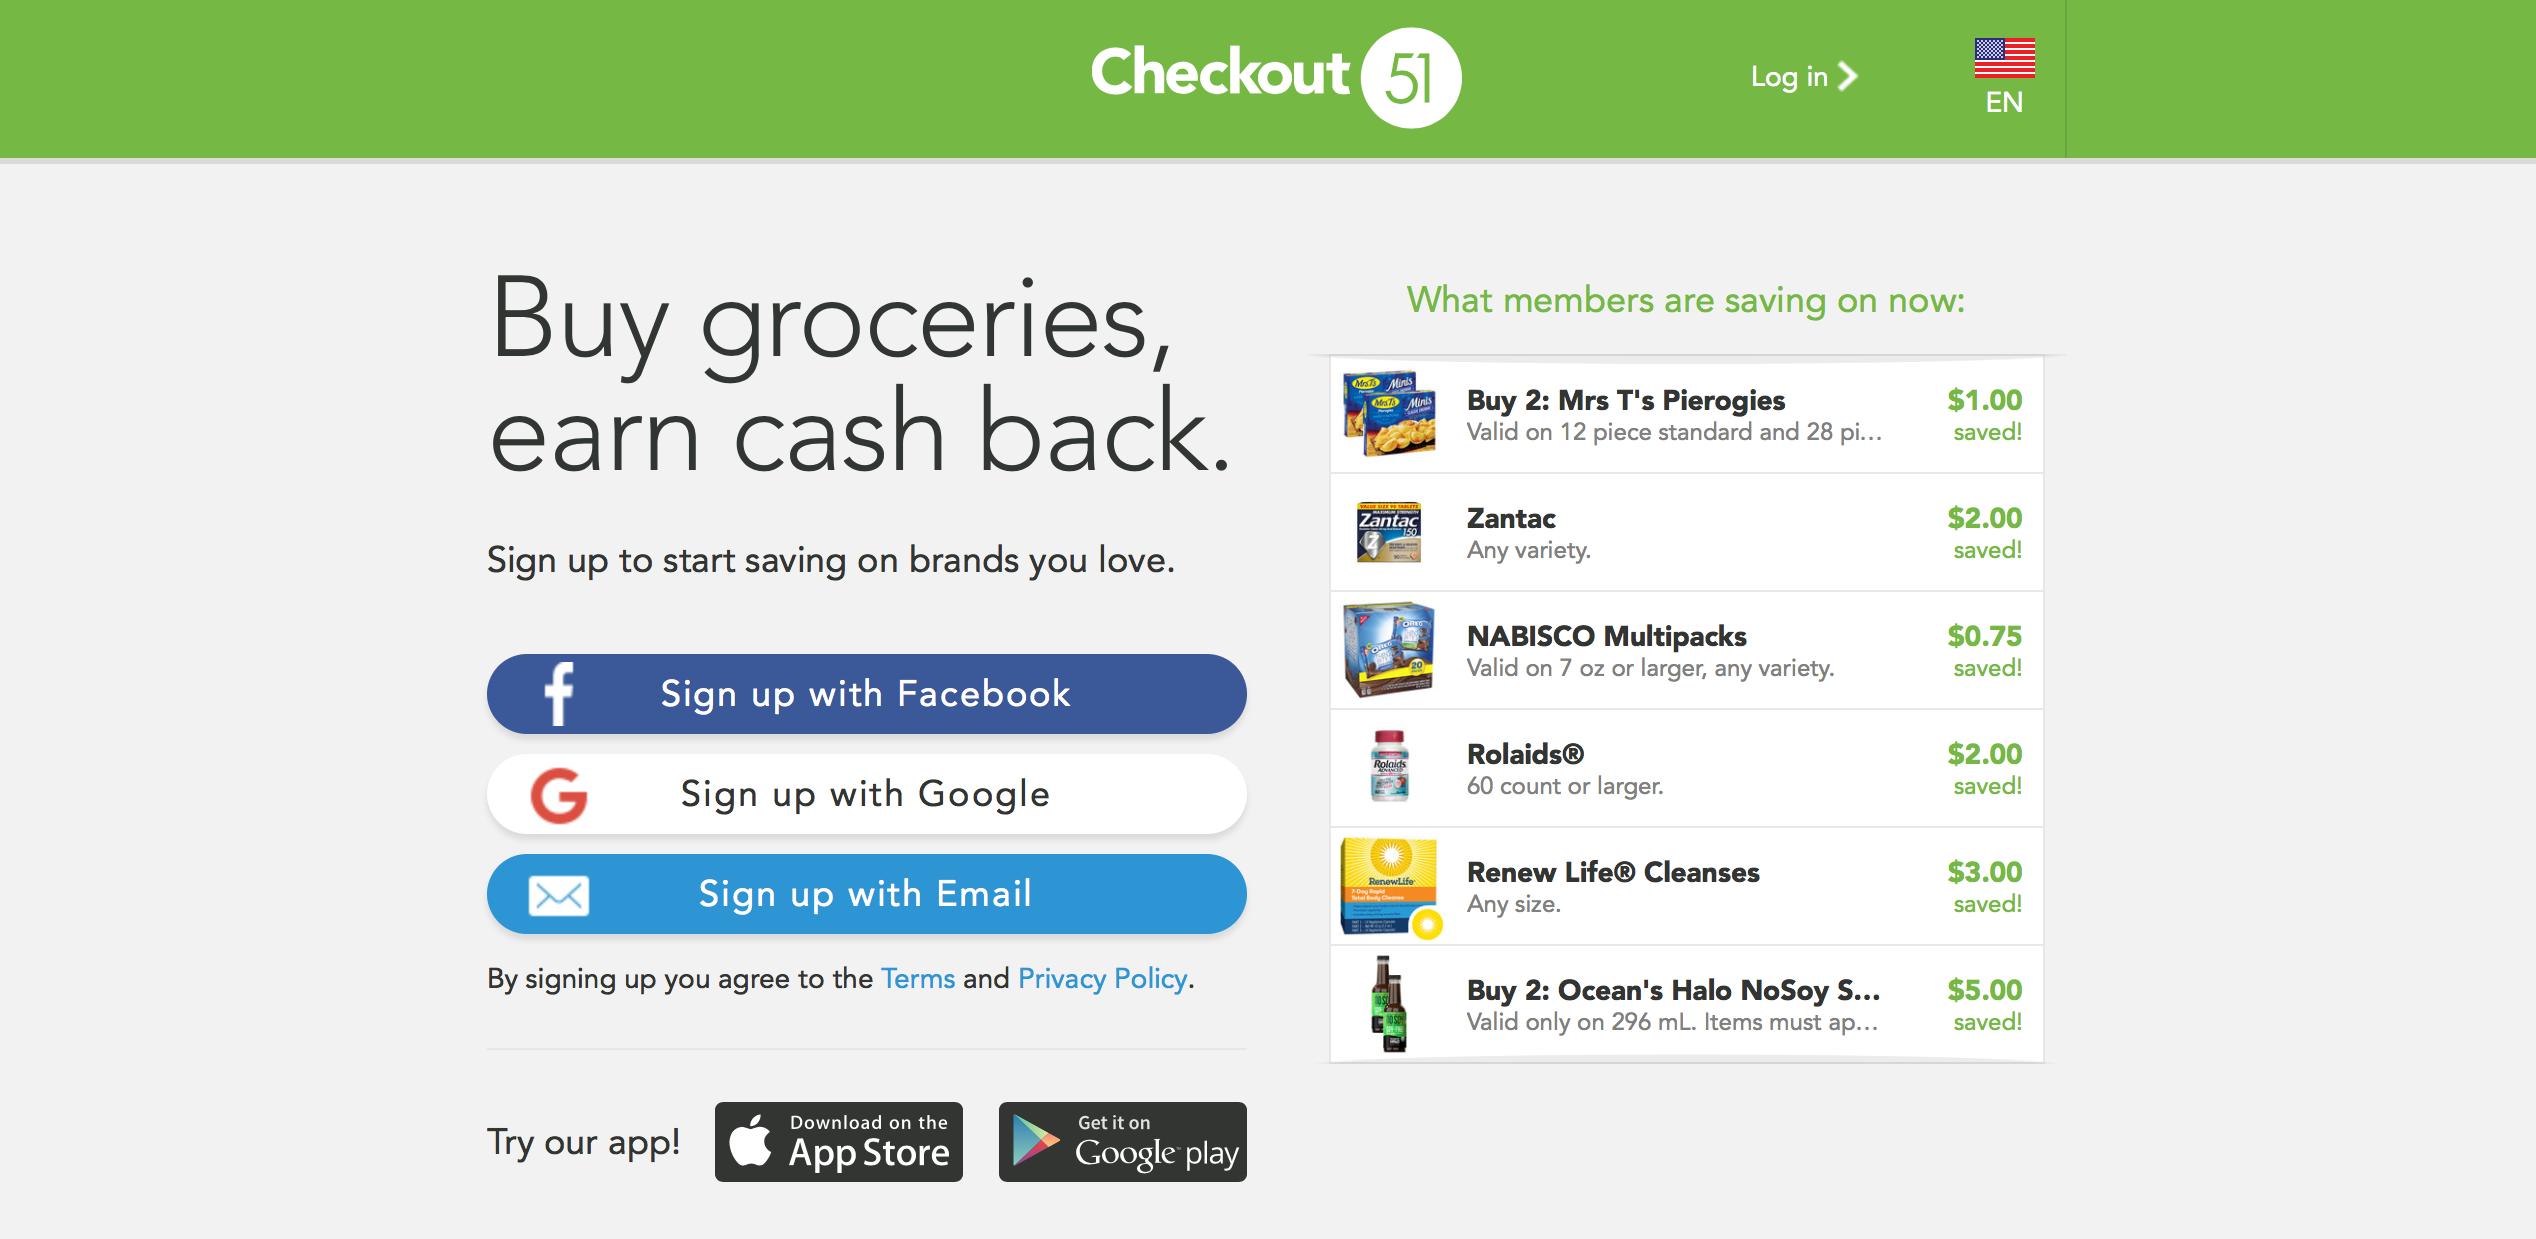 Checkout51 Cash Back App